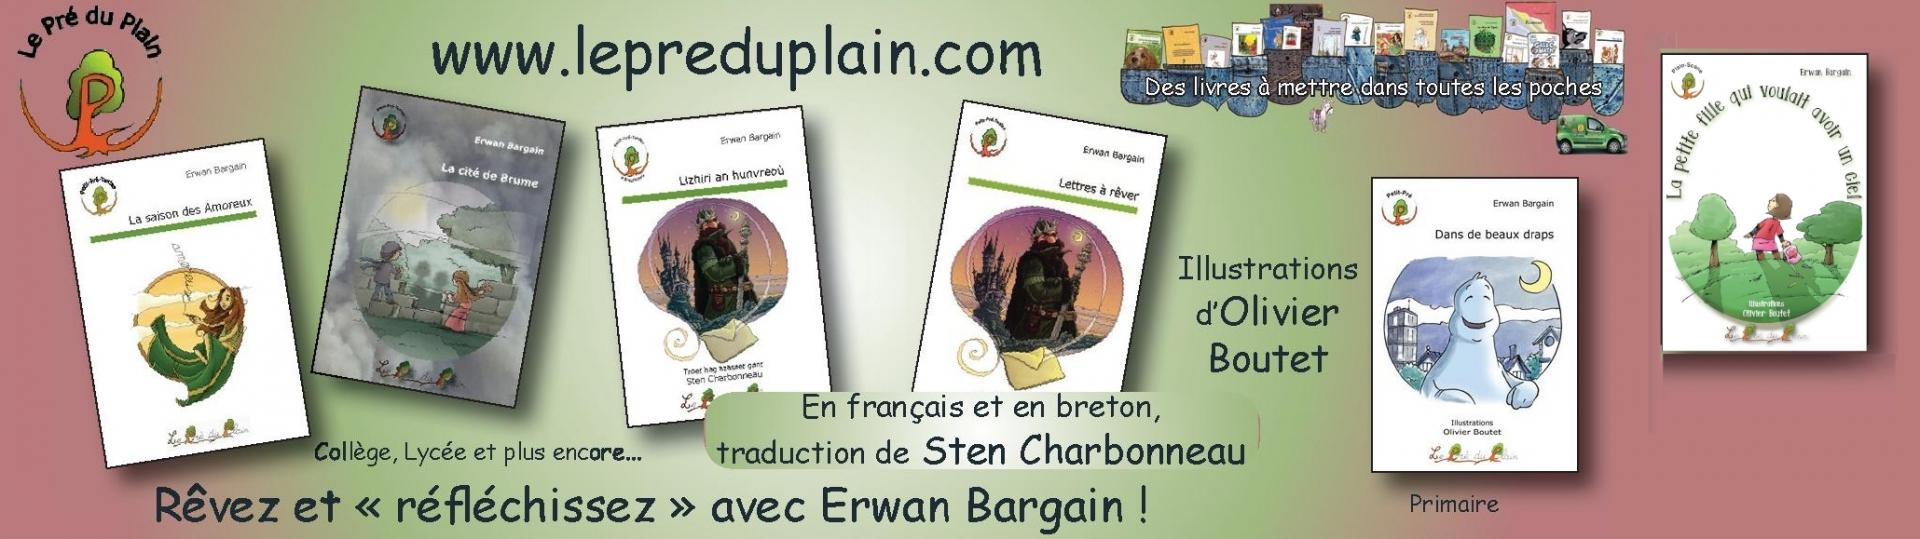 Com erwan bargain